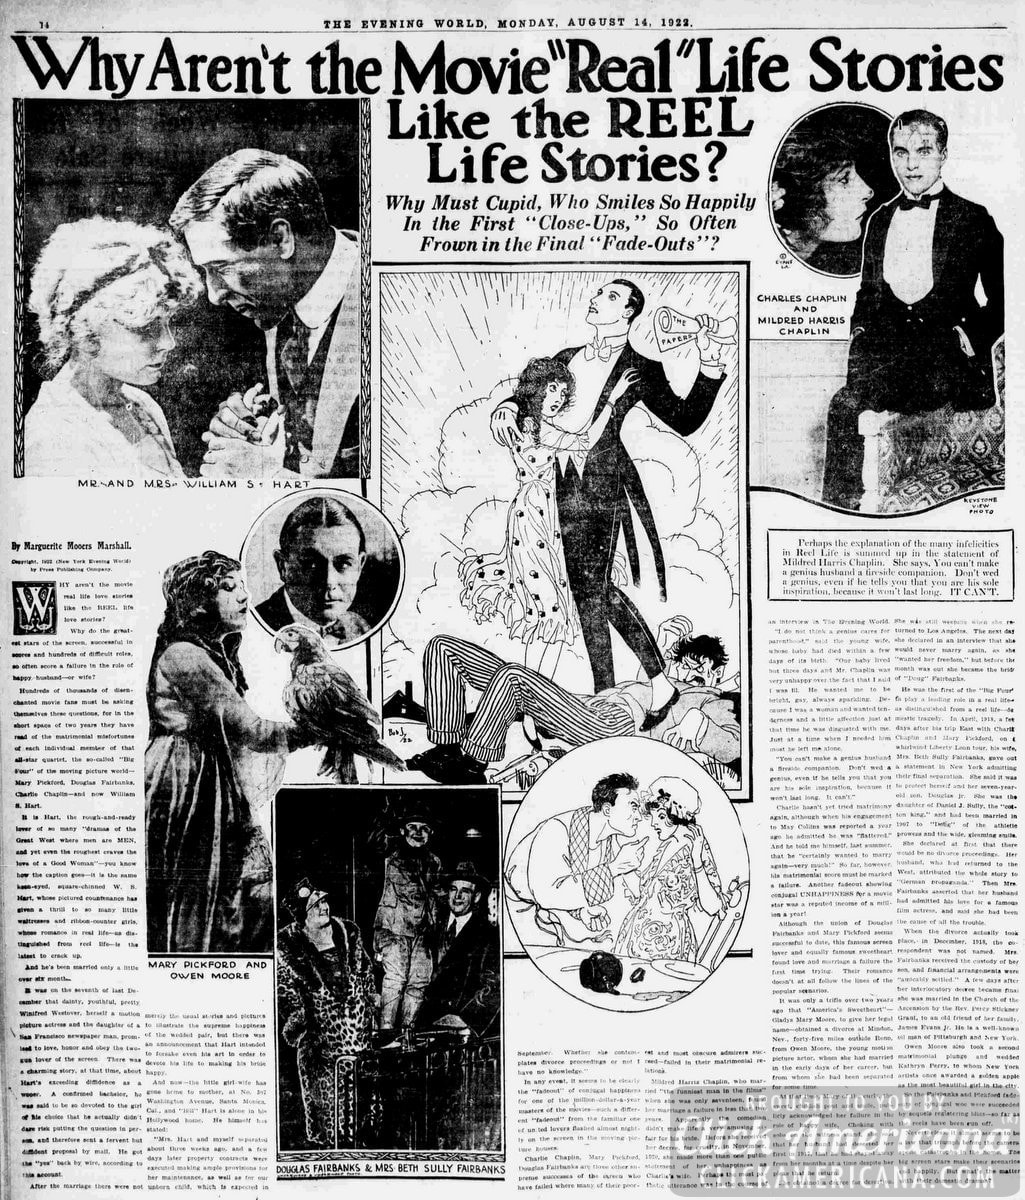 Where reel life romance meets real life (1922)